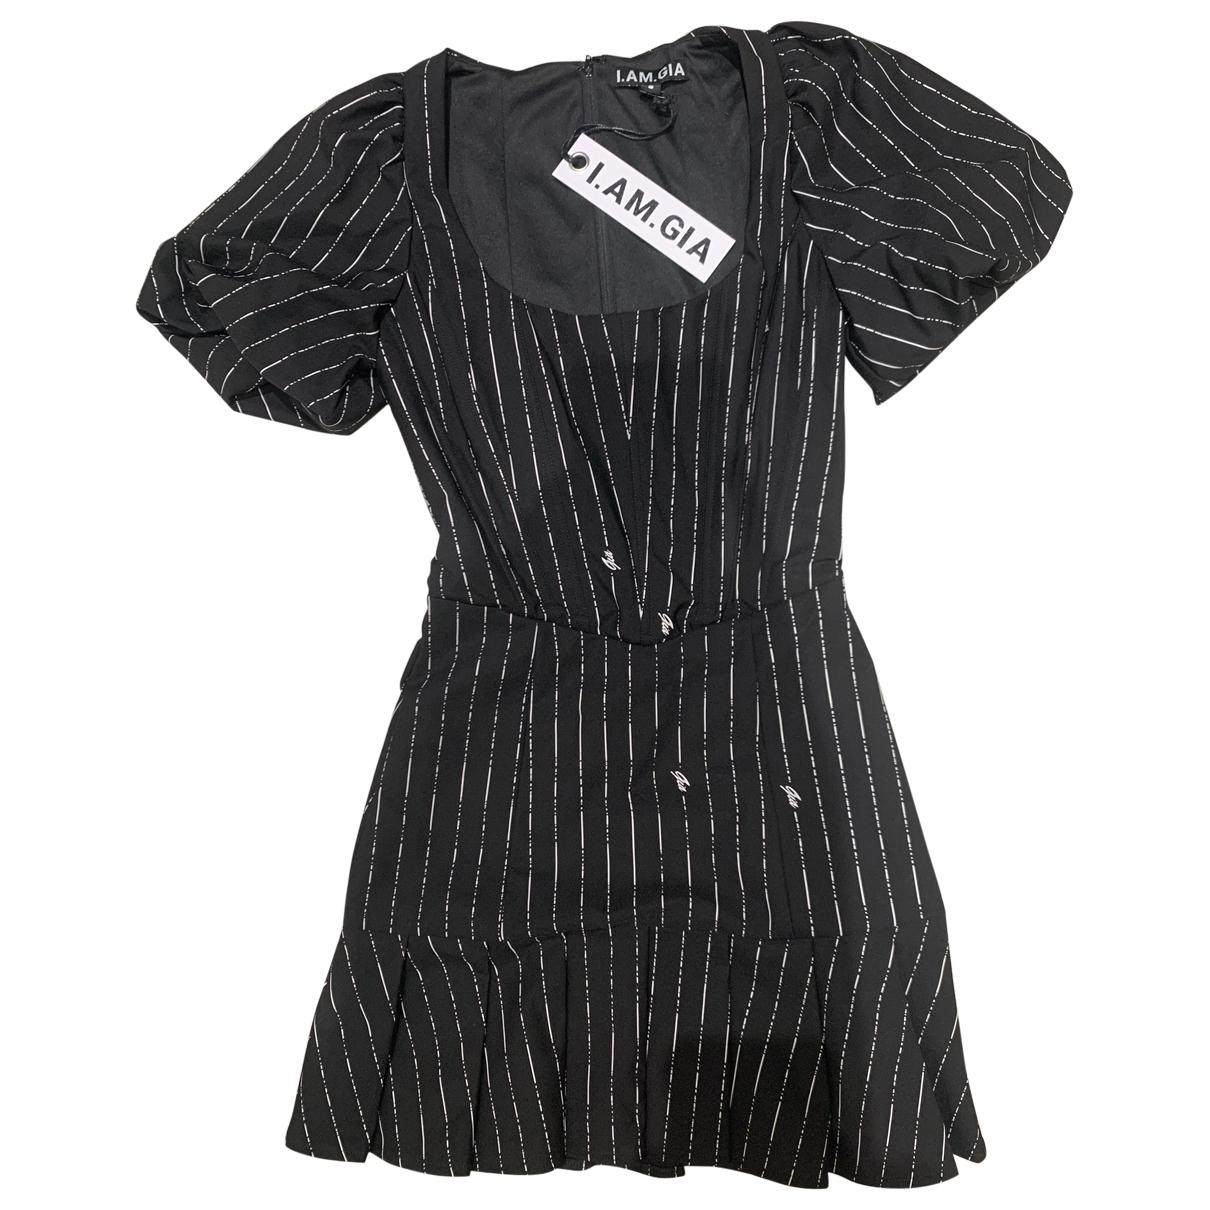 Mini vestido I.am.gia